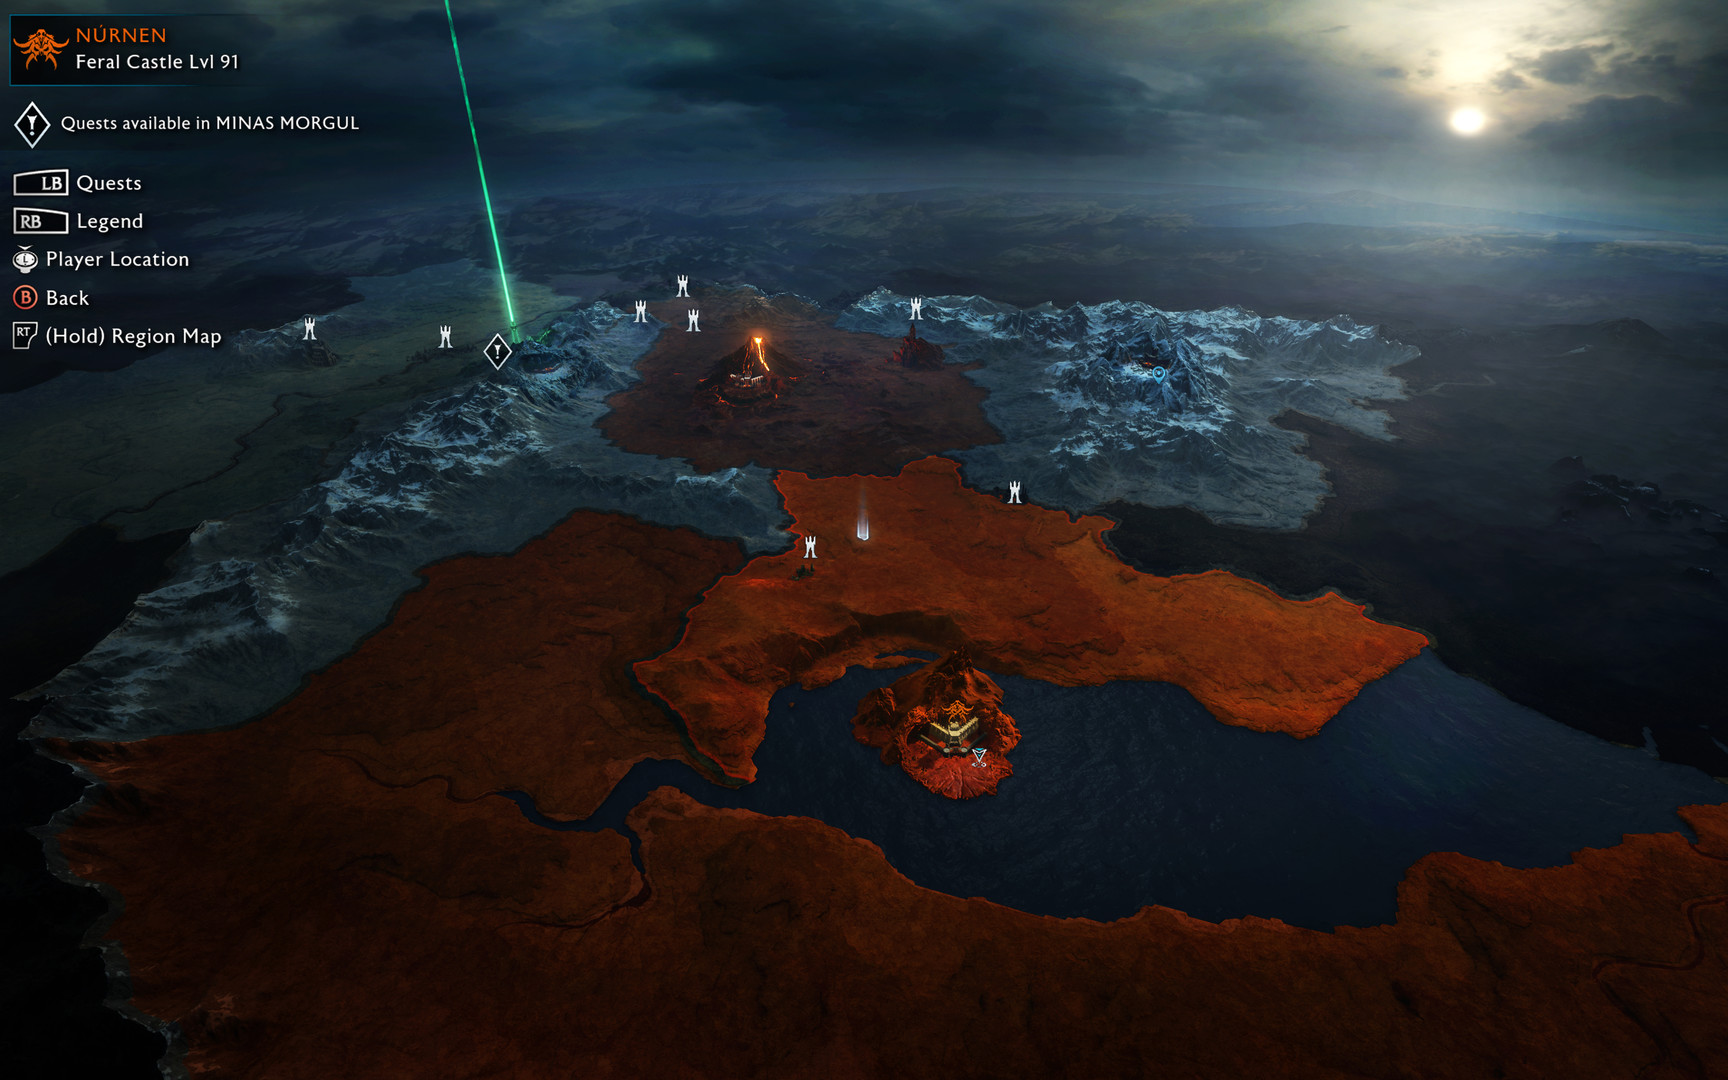 中土世界:战争之影(Middle Earth: Shadow of War)免安装中文绿色版|DLC|升级档|网盘下载